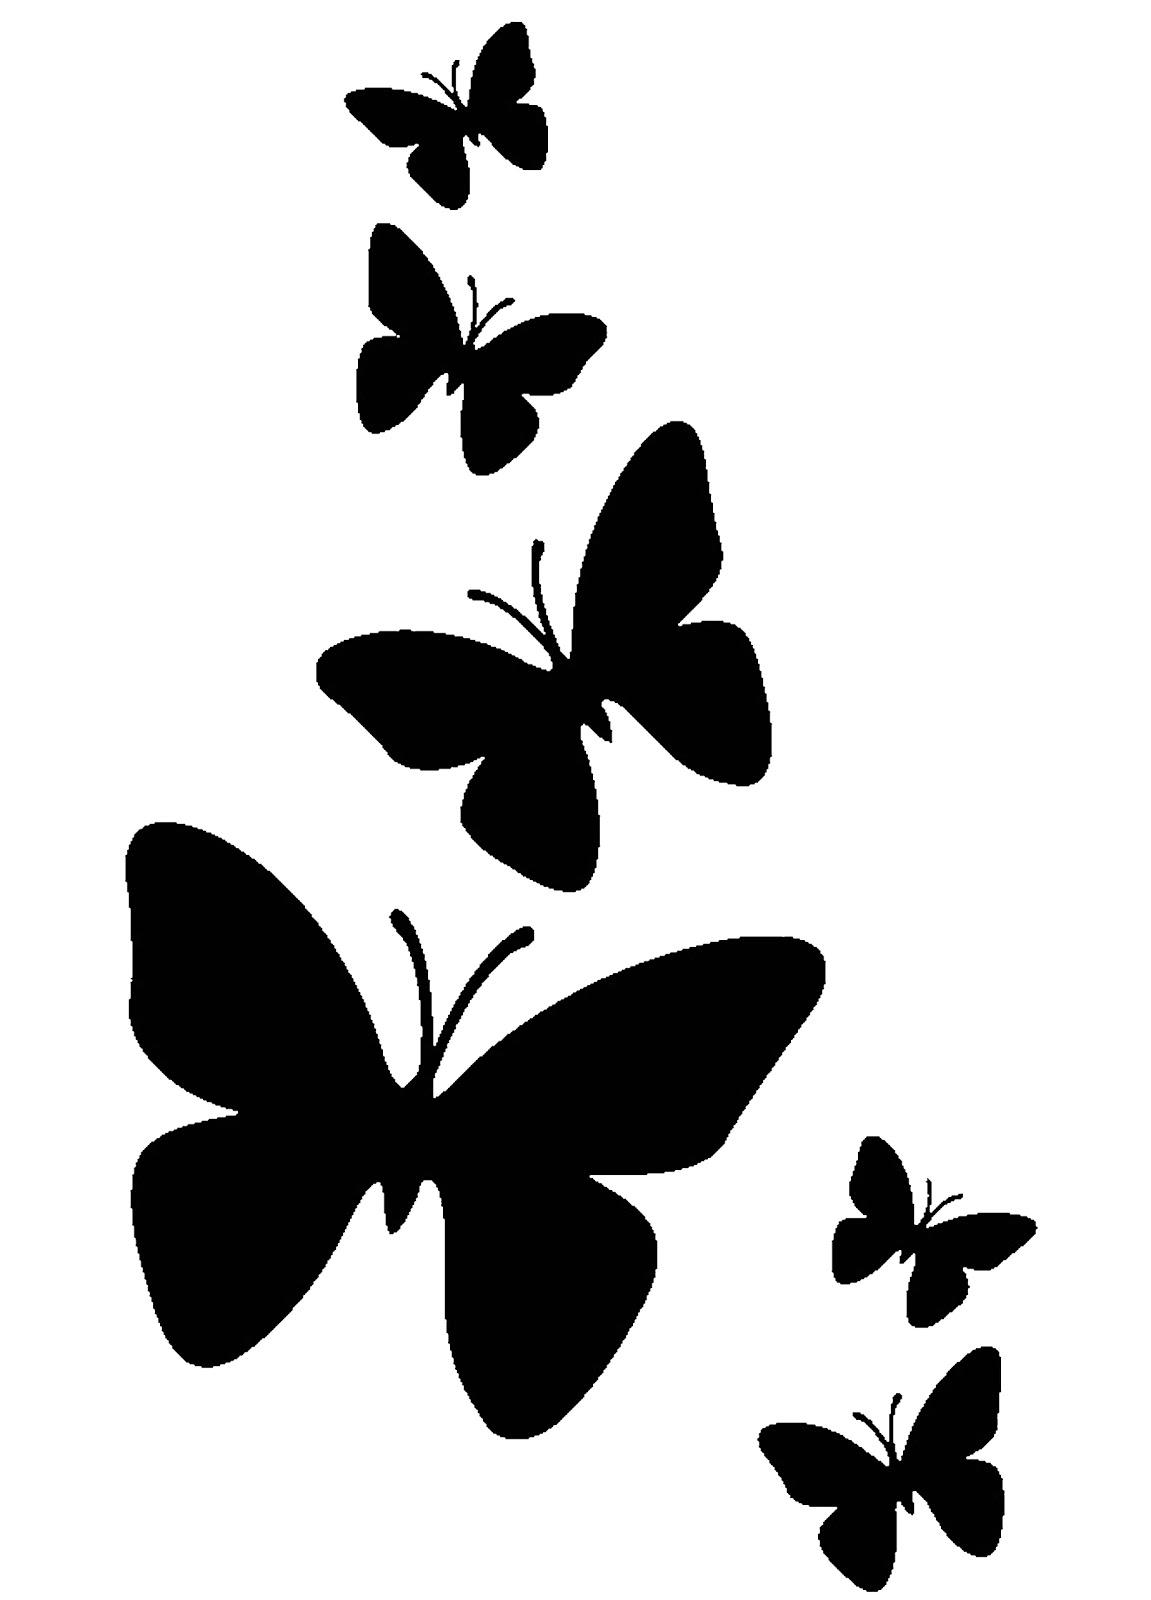 Dorable Plantilla De Mariposa Gratis Composición - Colección De ...